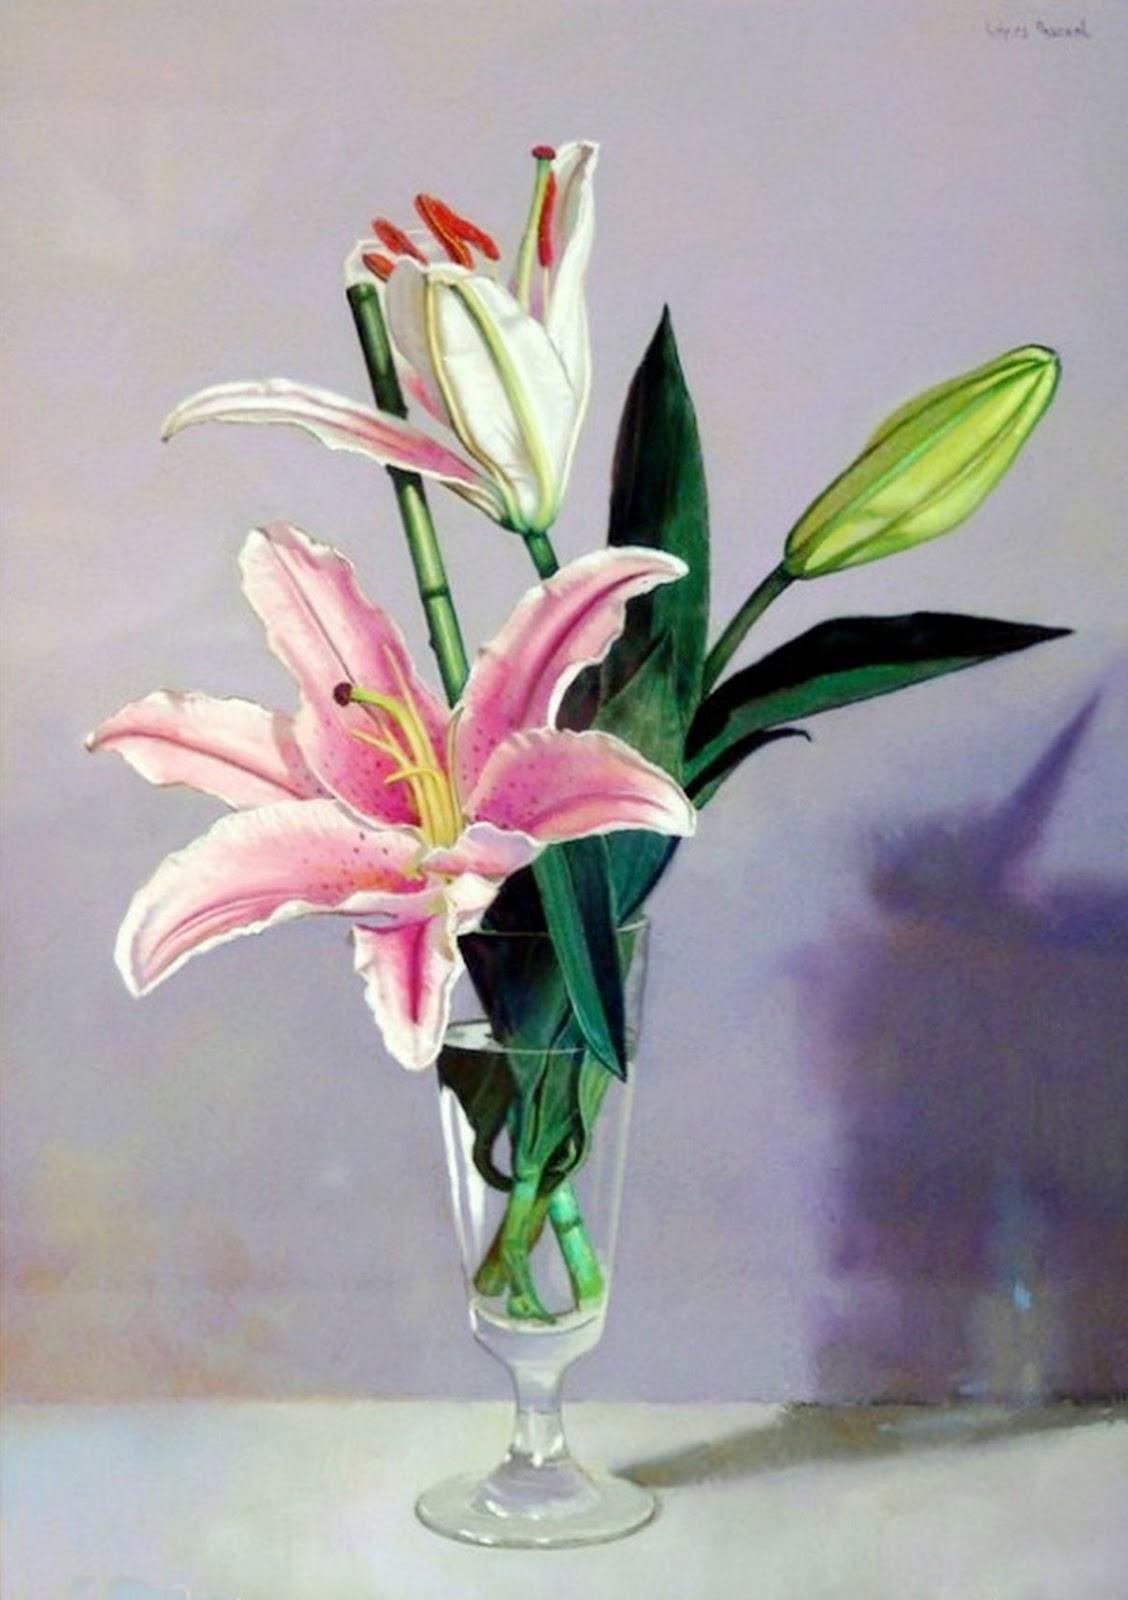 Cuadros modernos pinturas y dibujos cuadros flores - Floreros modernos ...